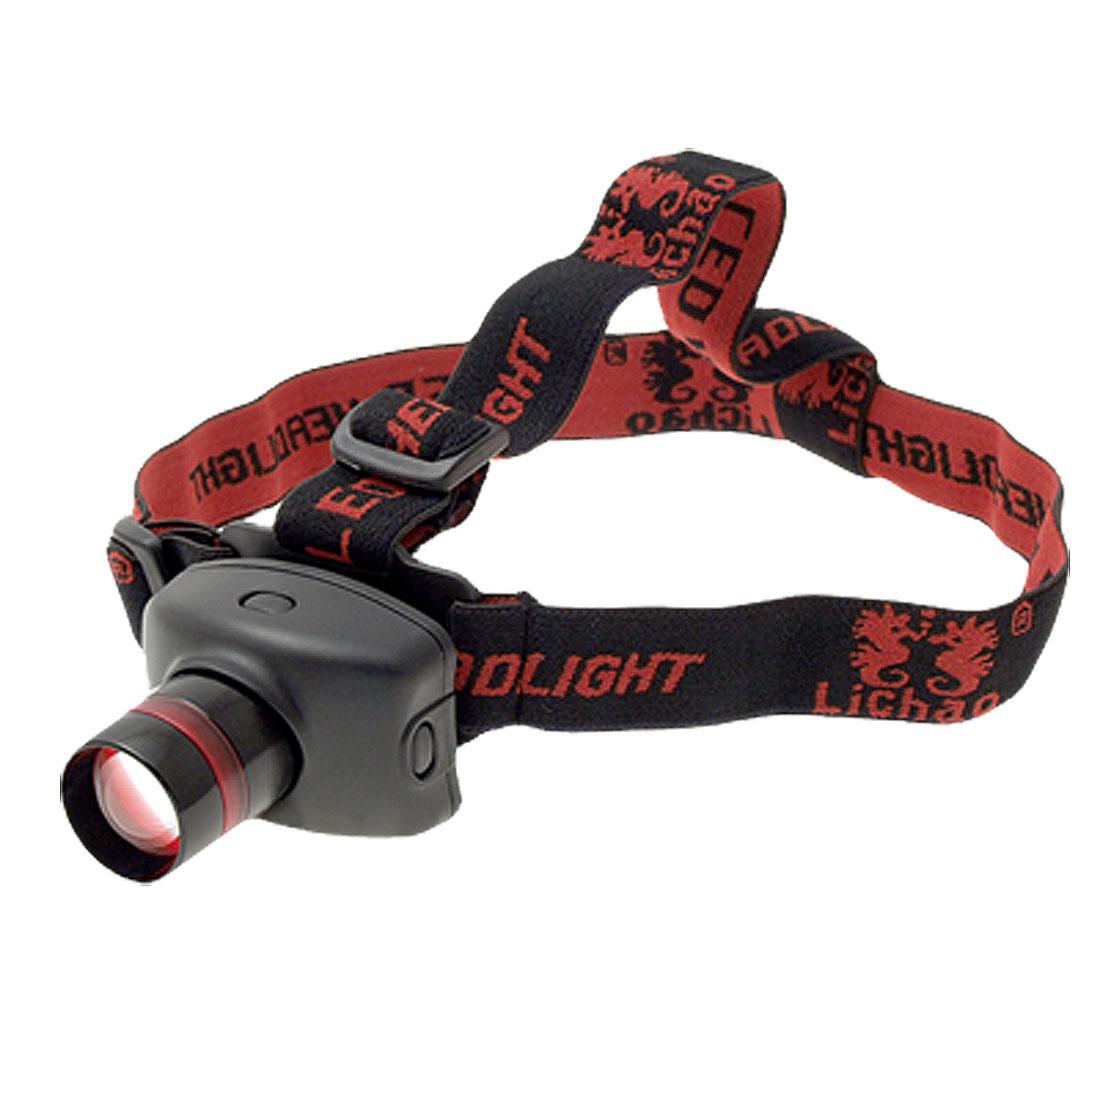 3 Modes LED Focus Control Elastic Strap Headlight Headlamp